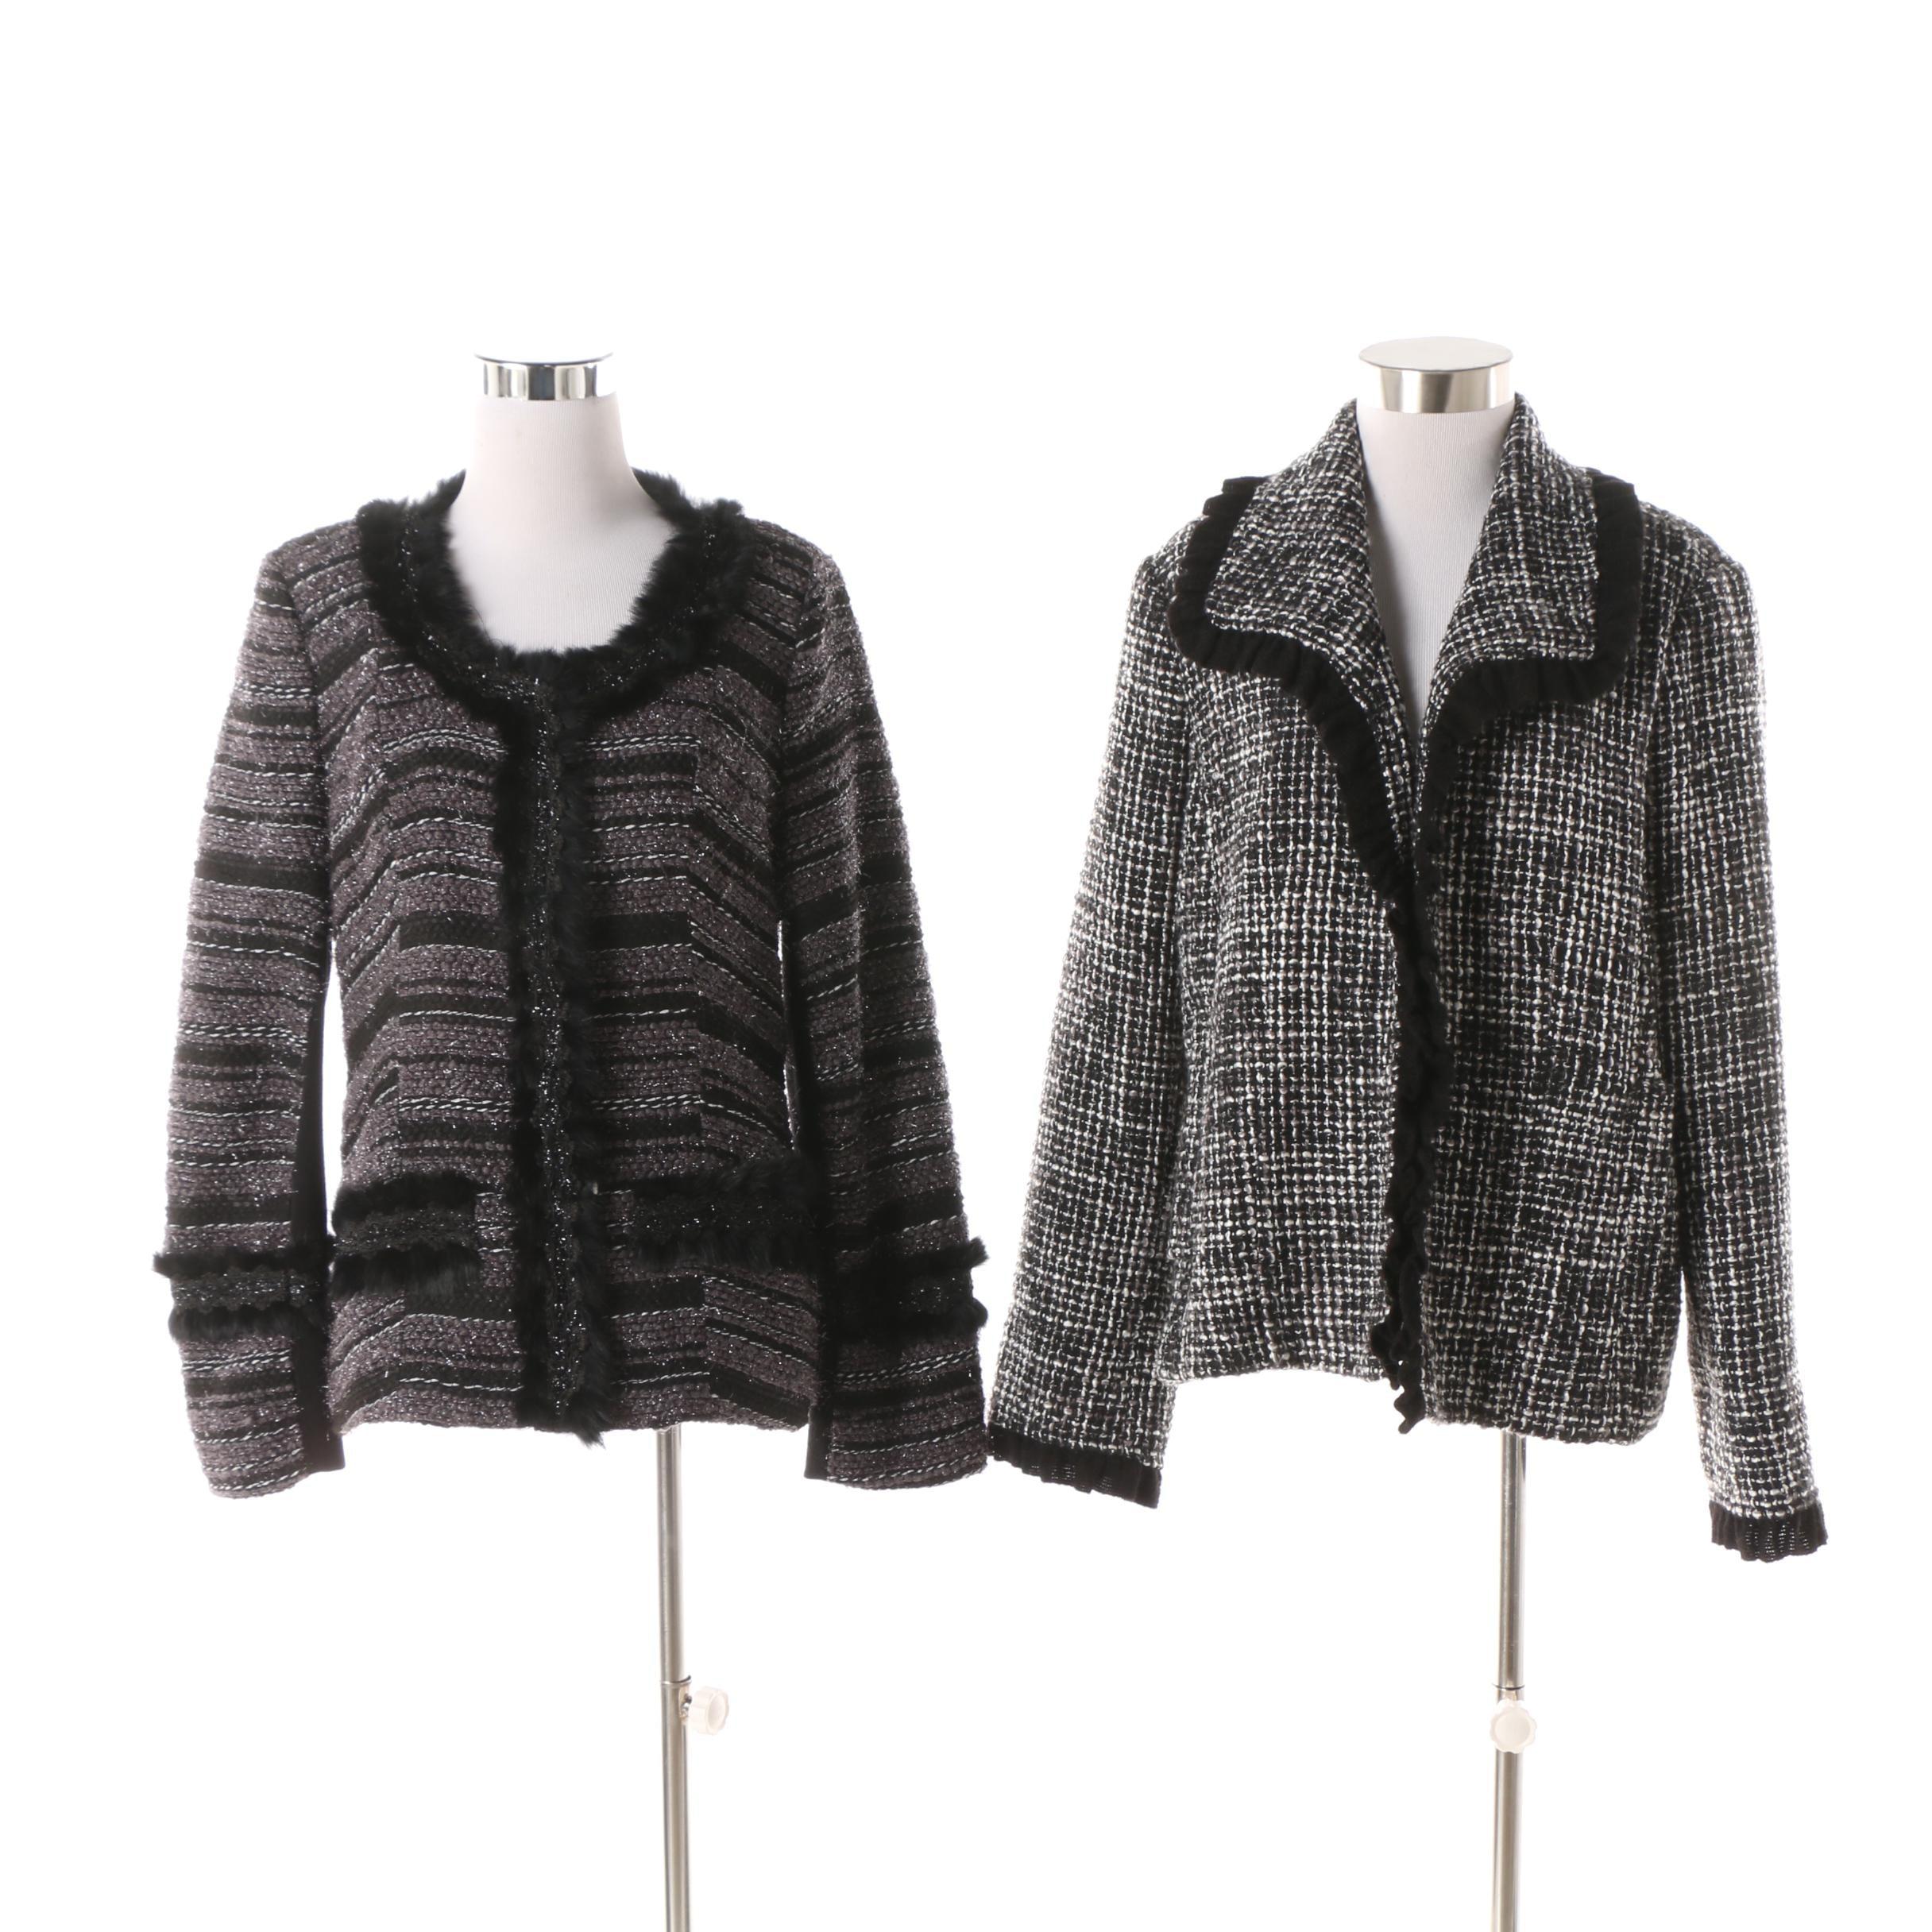 Women's Suit Separates Including Neiman Marcus Rabbit Fur Trimmed Jacket